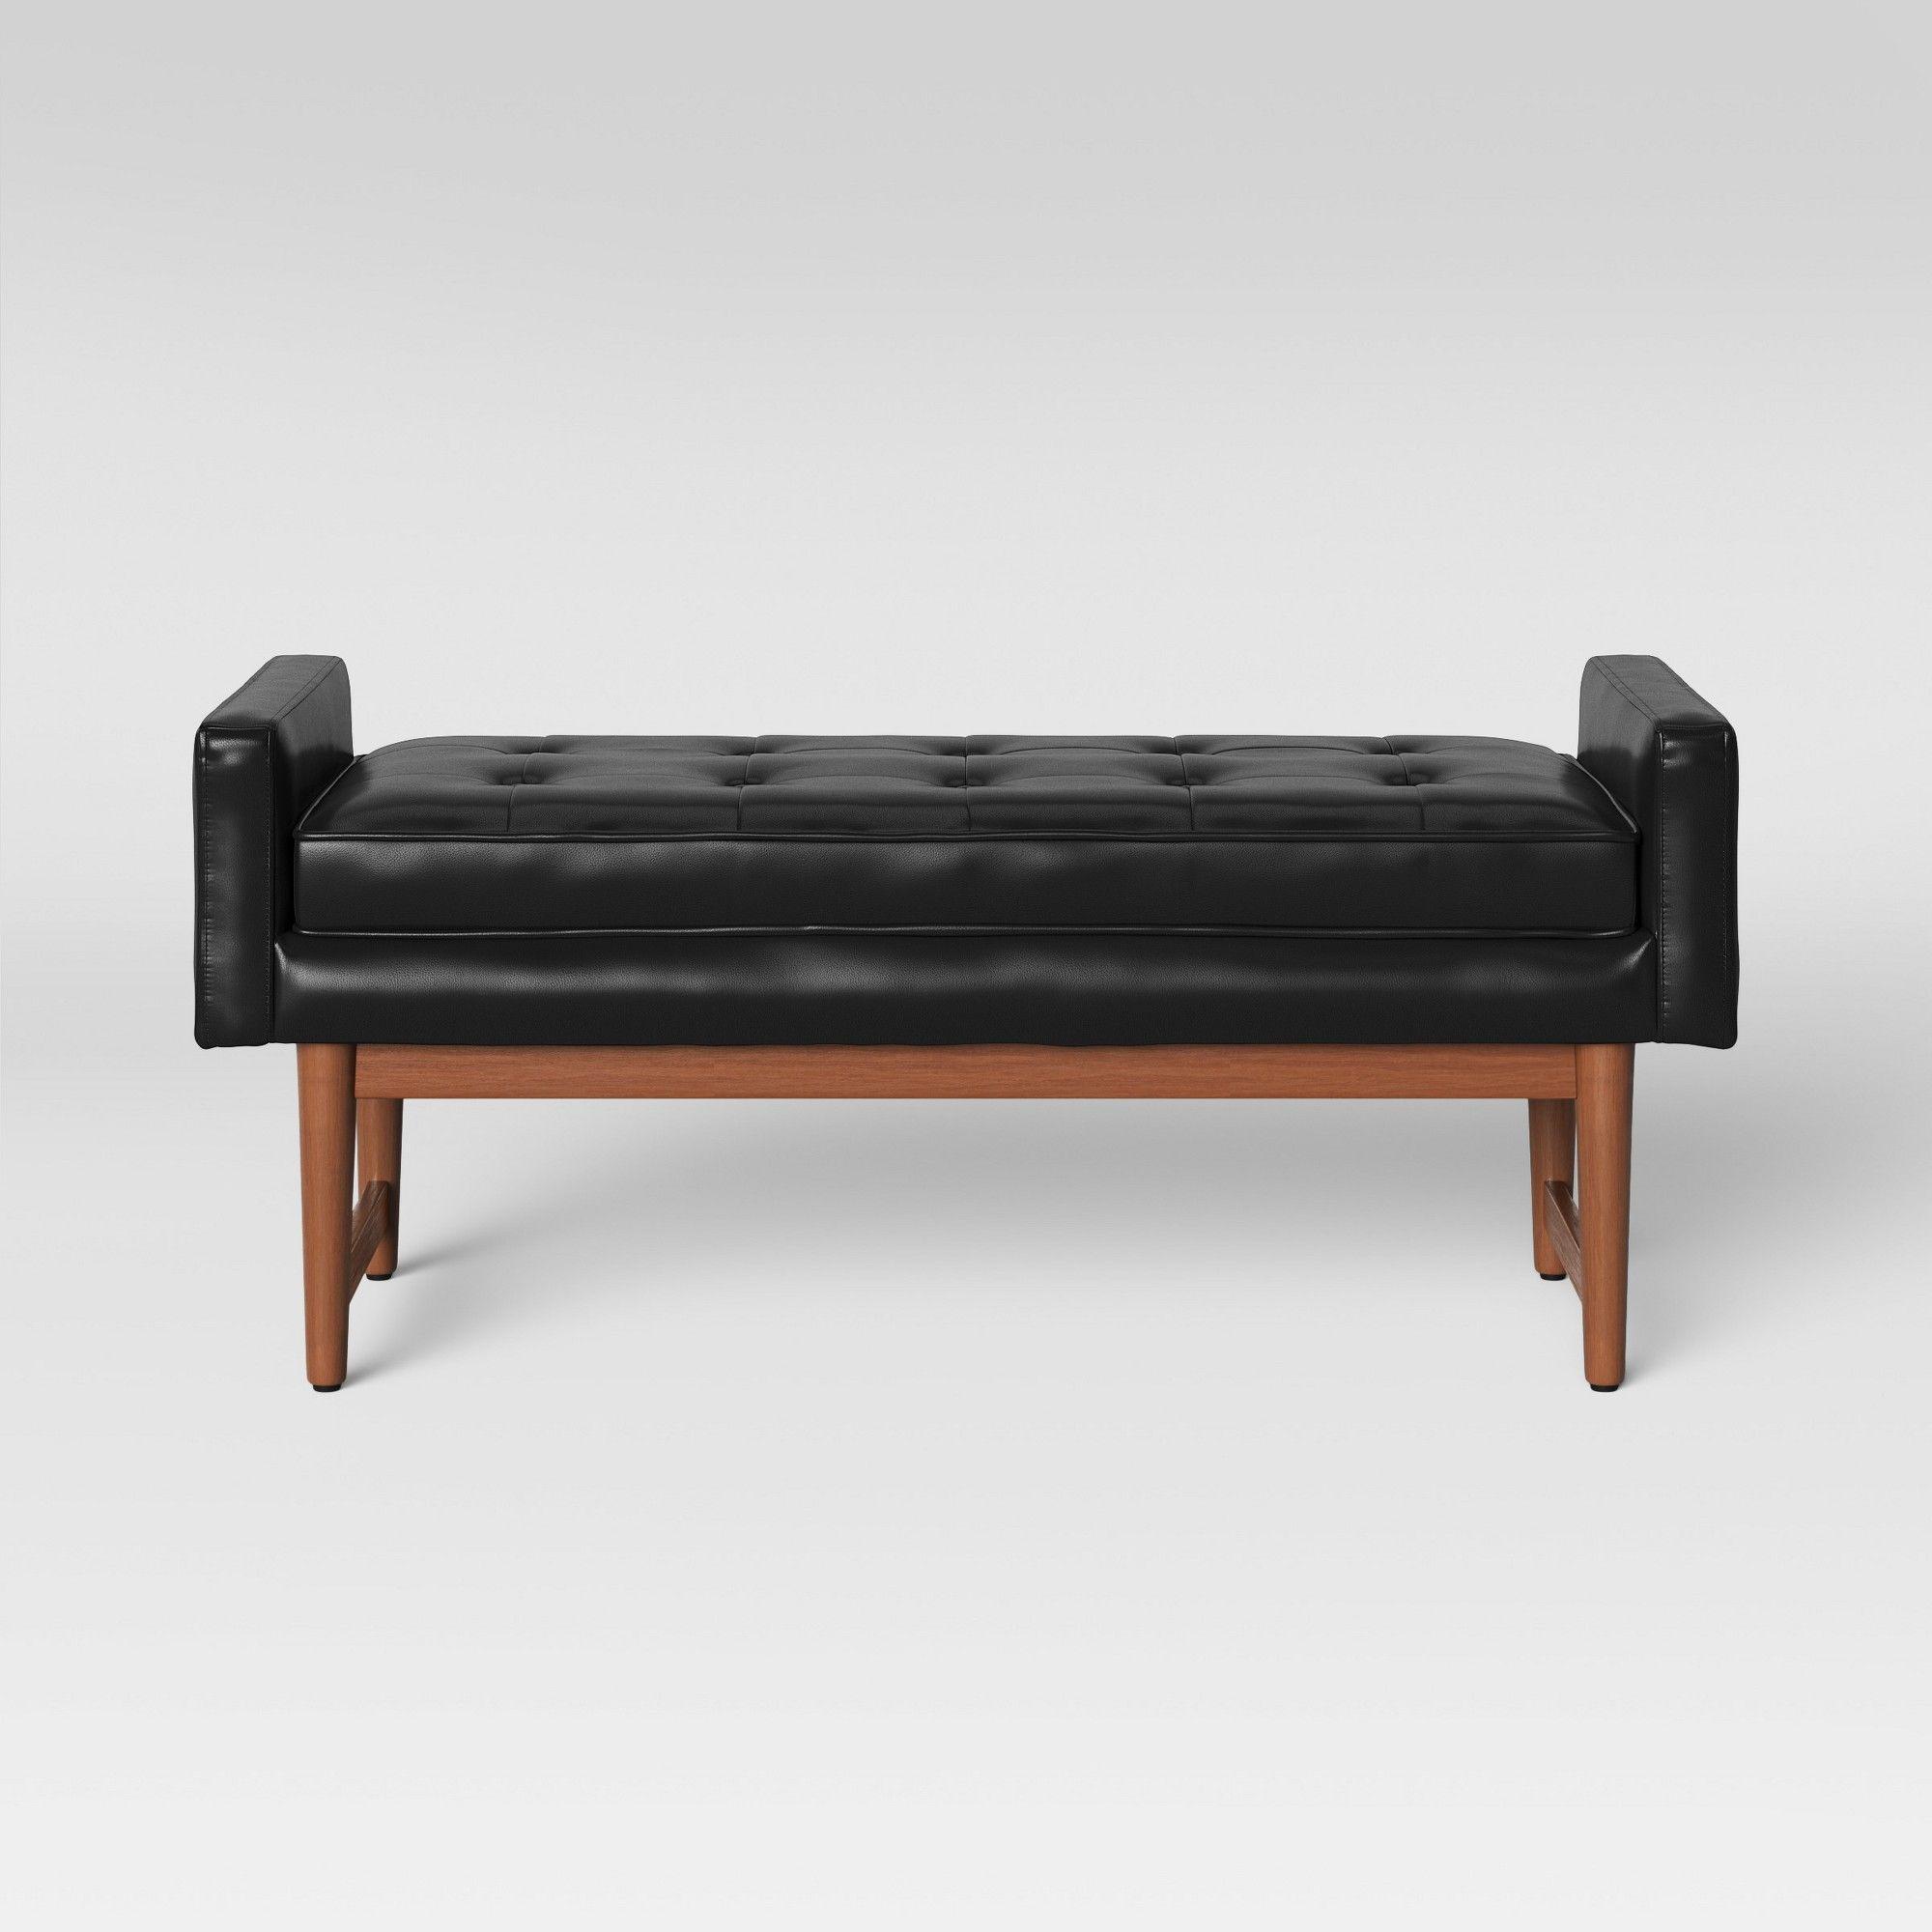 Pleasing Verken Mid Century Modern Faux Leather Bench Black Project Spiritservingveterans Wood Chair Design Ideas Spiritservingveteransorg